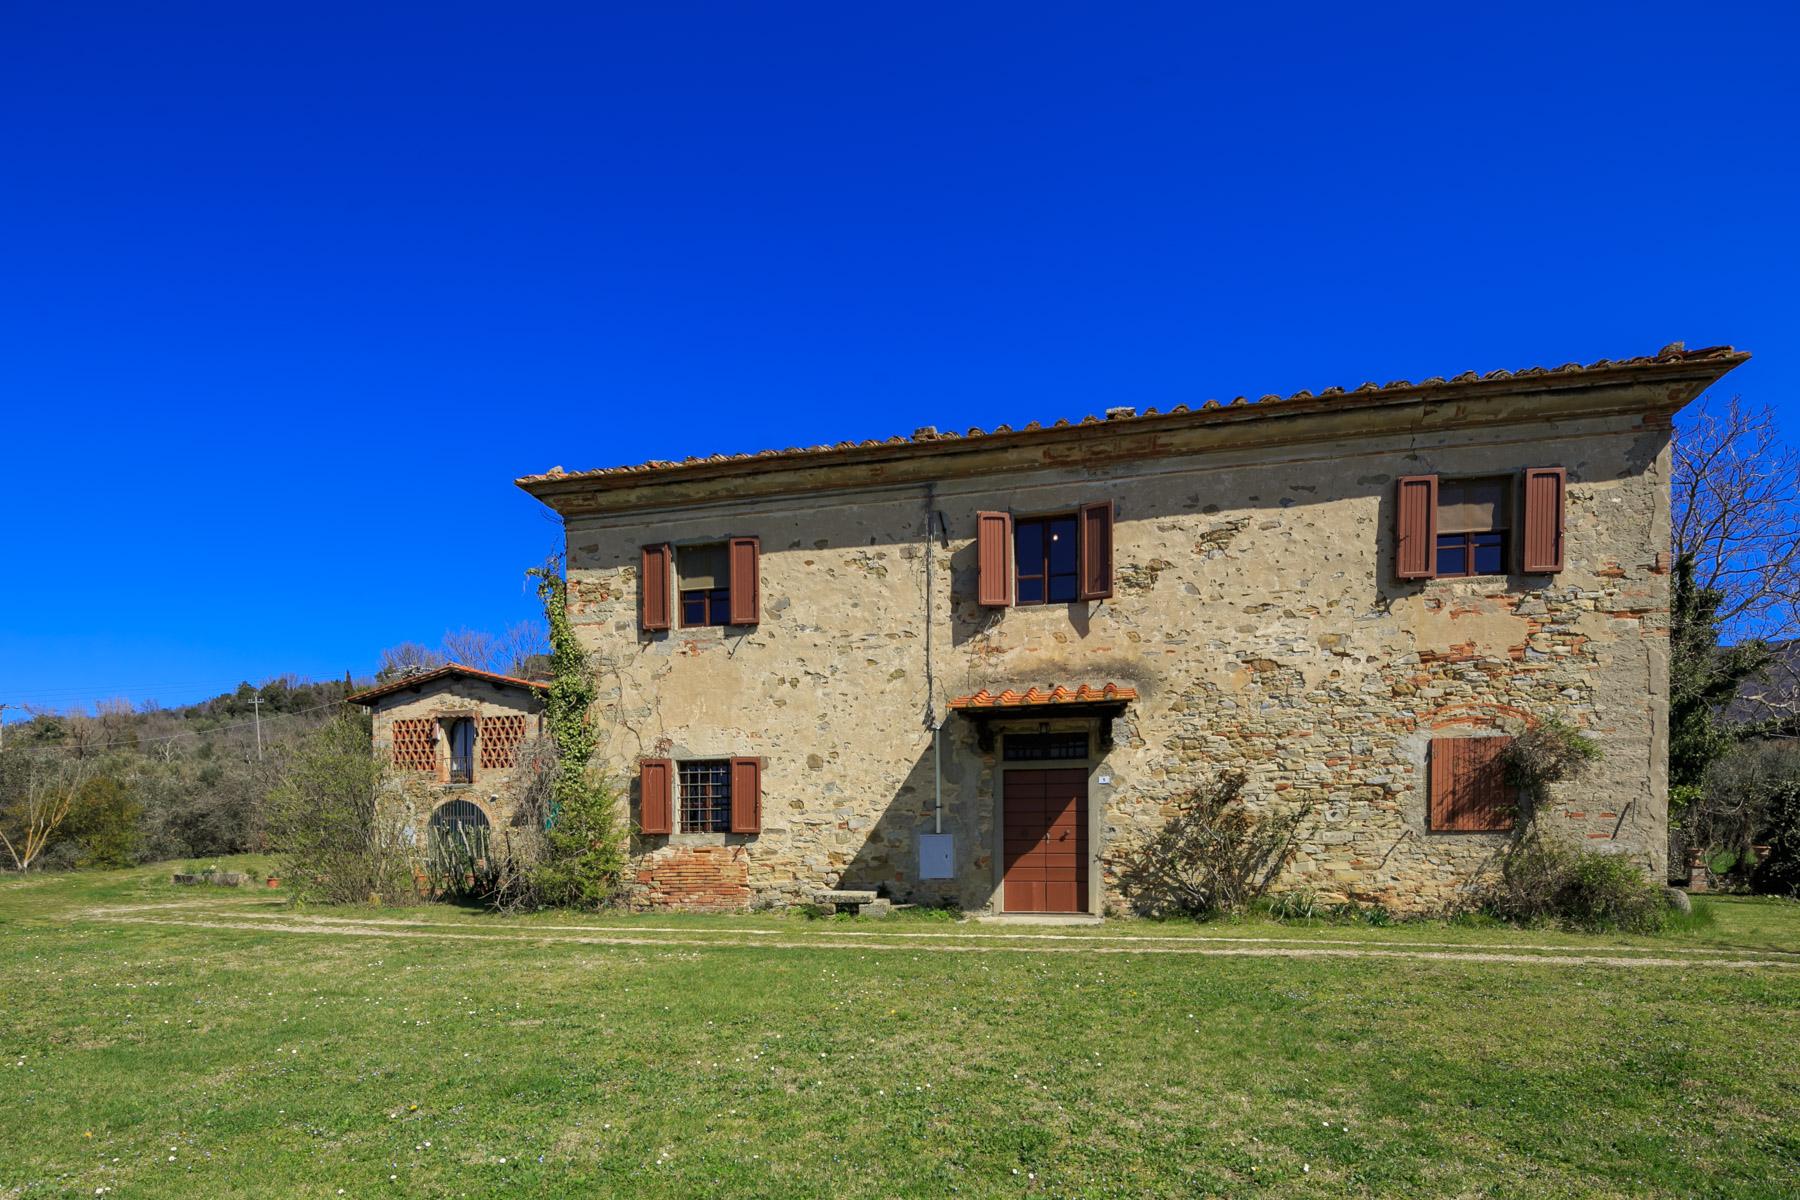 Casa indipendente in Vendita a Castelfranco Di Sopra: 5 locali, 800 mq